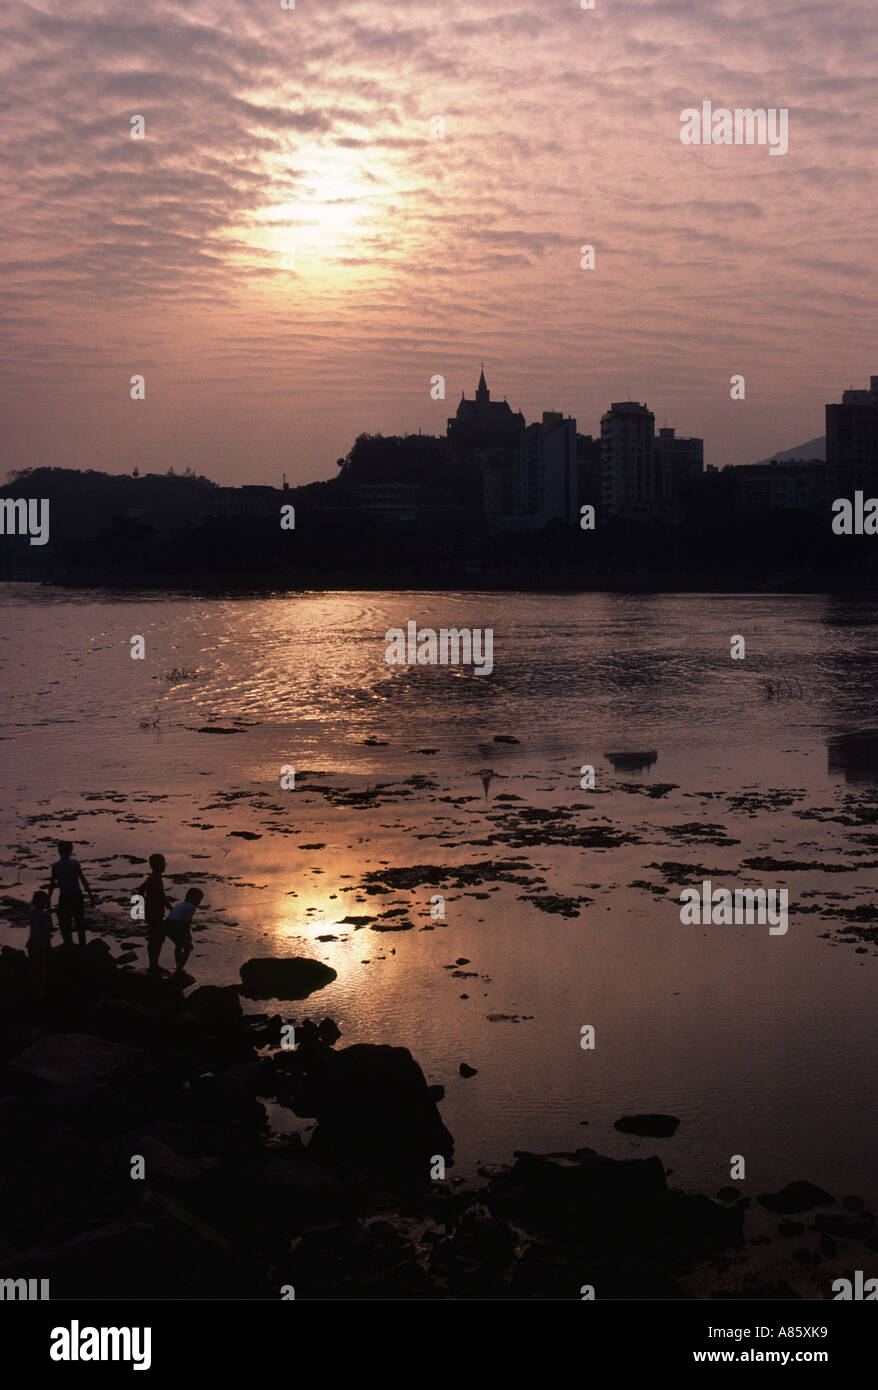 Family group- Macau sunset - Stock Image